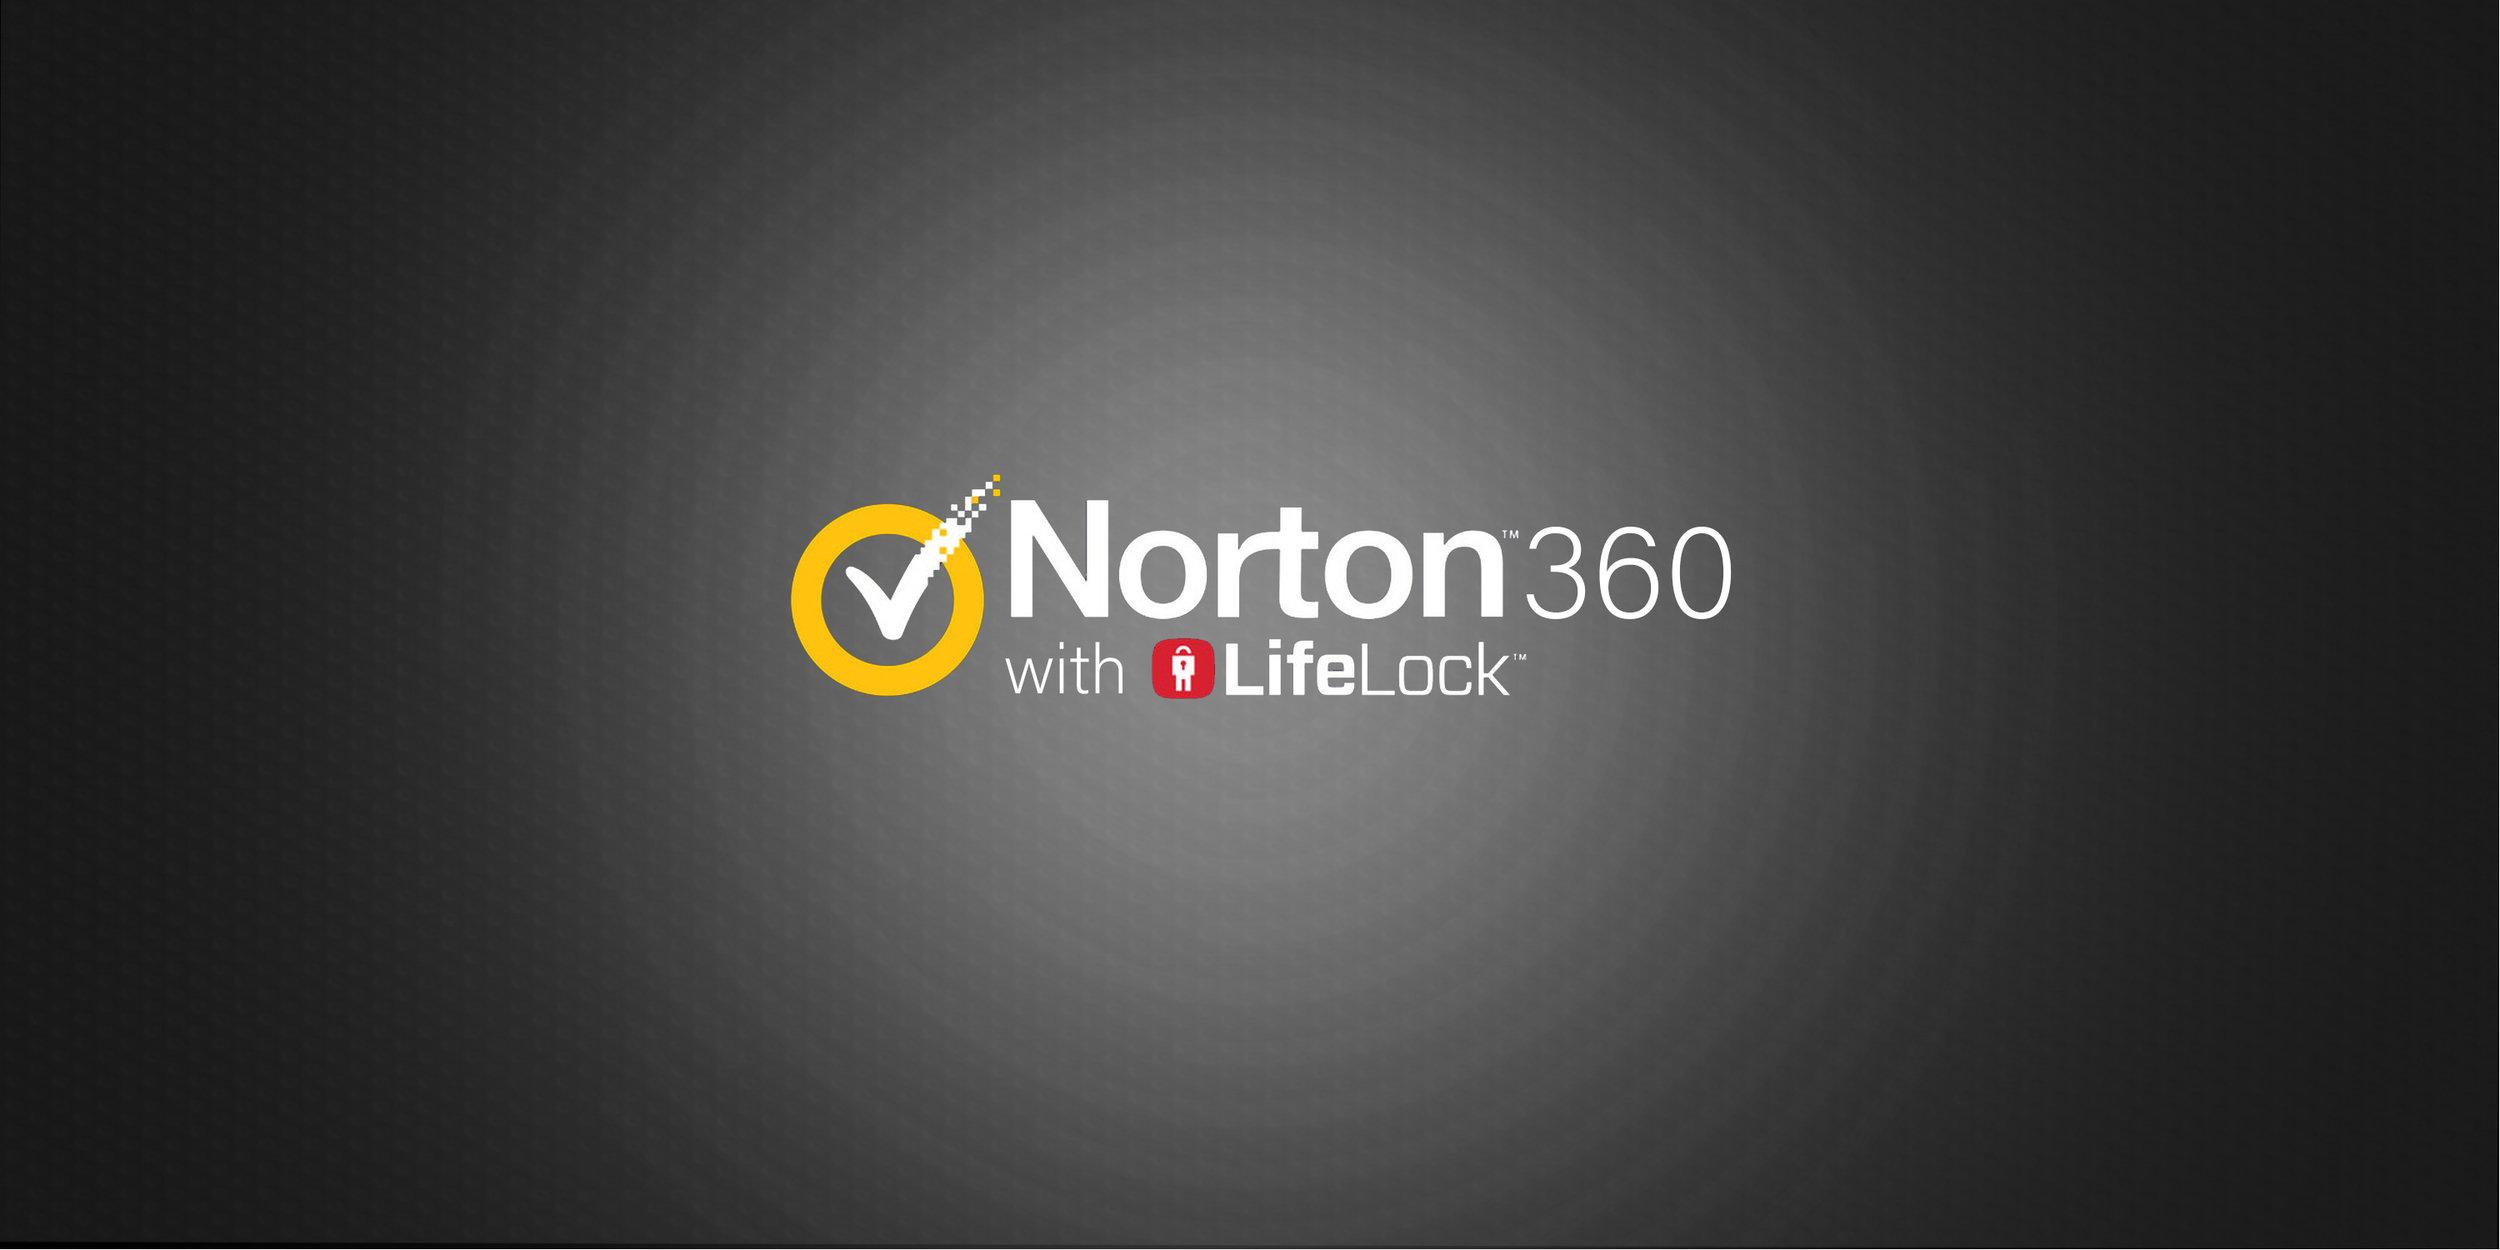 New_Norton_EndFrames copy copy.jpg